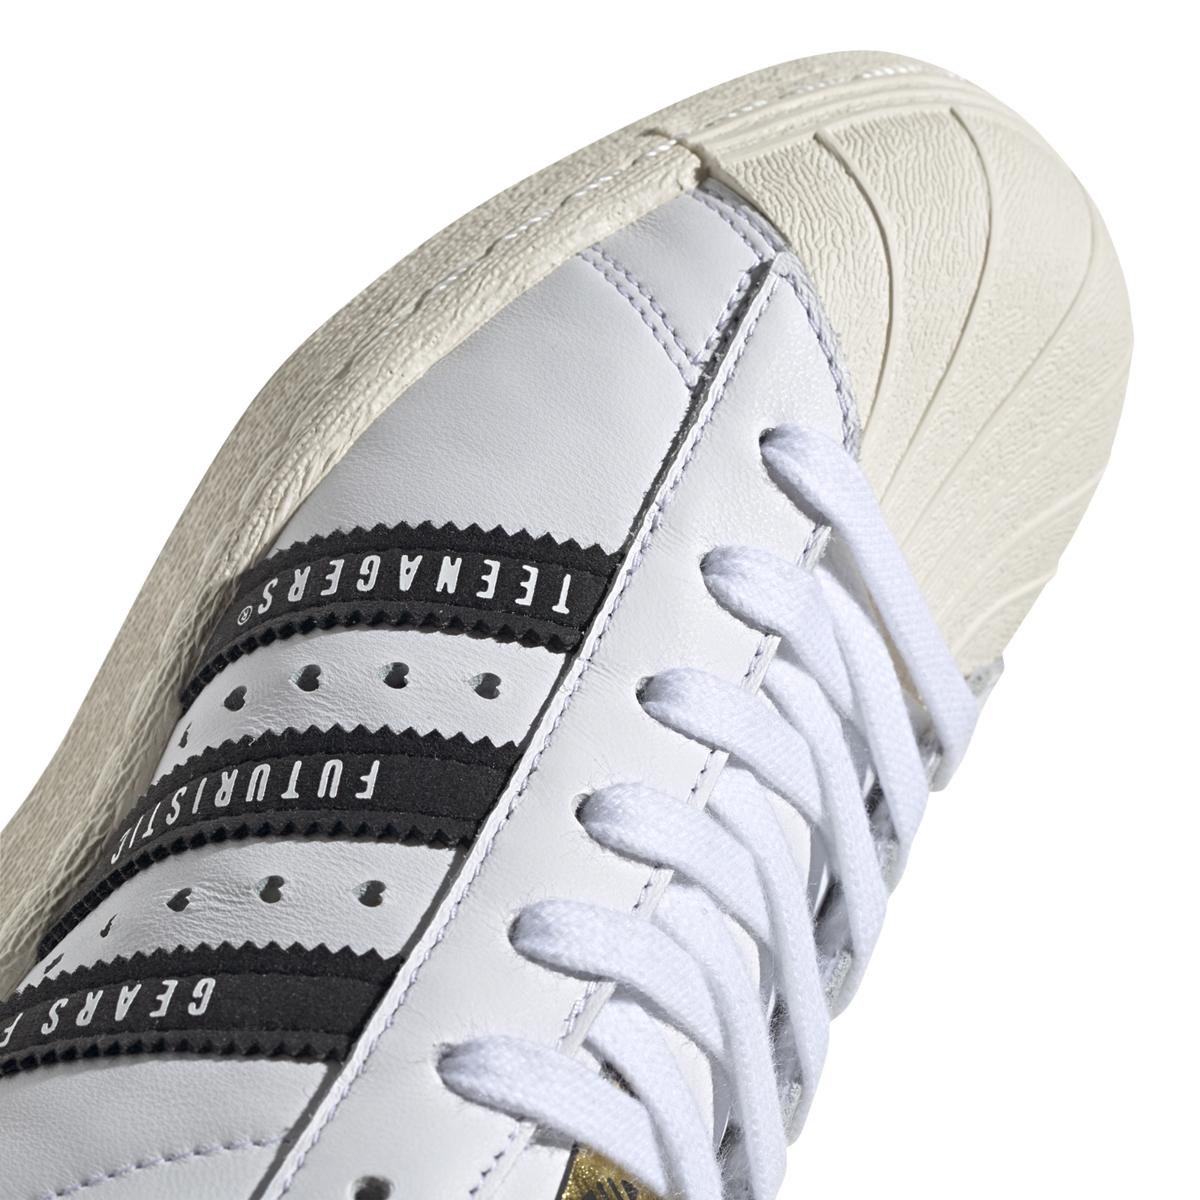 adidas X Human Made Superstar 80s